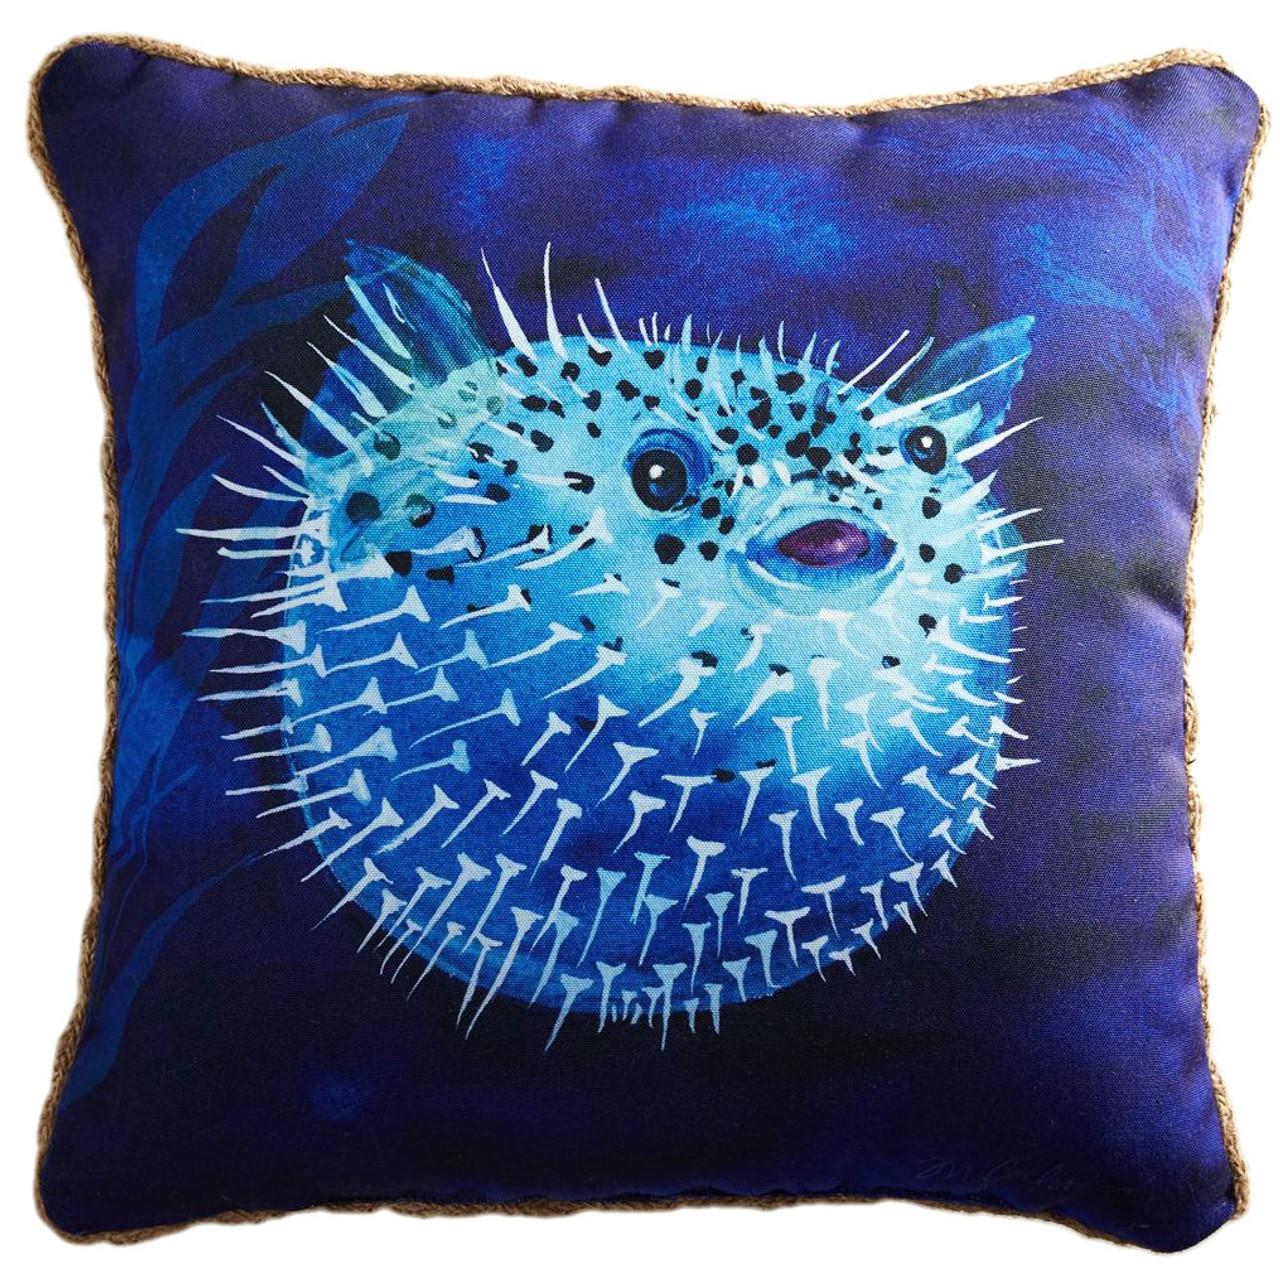 Printed Puffer Fish 20 Blue Decor Throw Accent Pillow 3273035 Tropicalbreezedecor